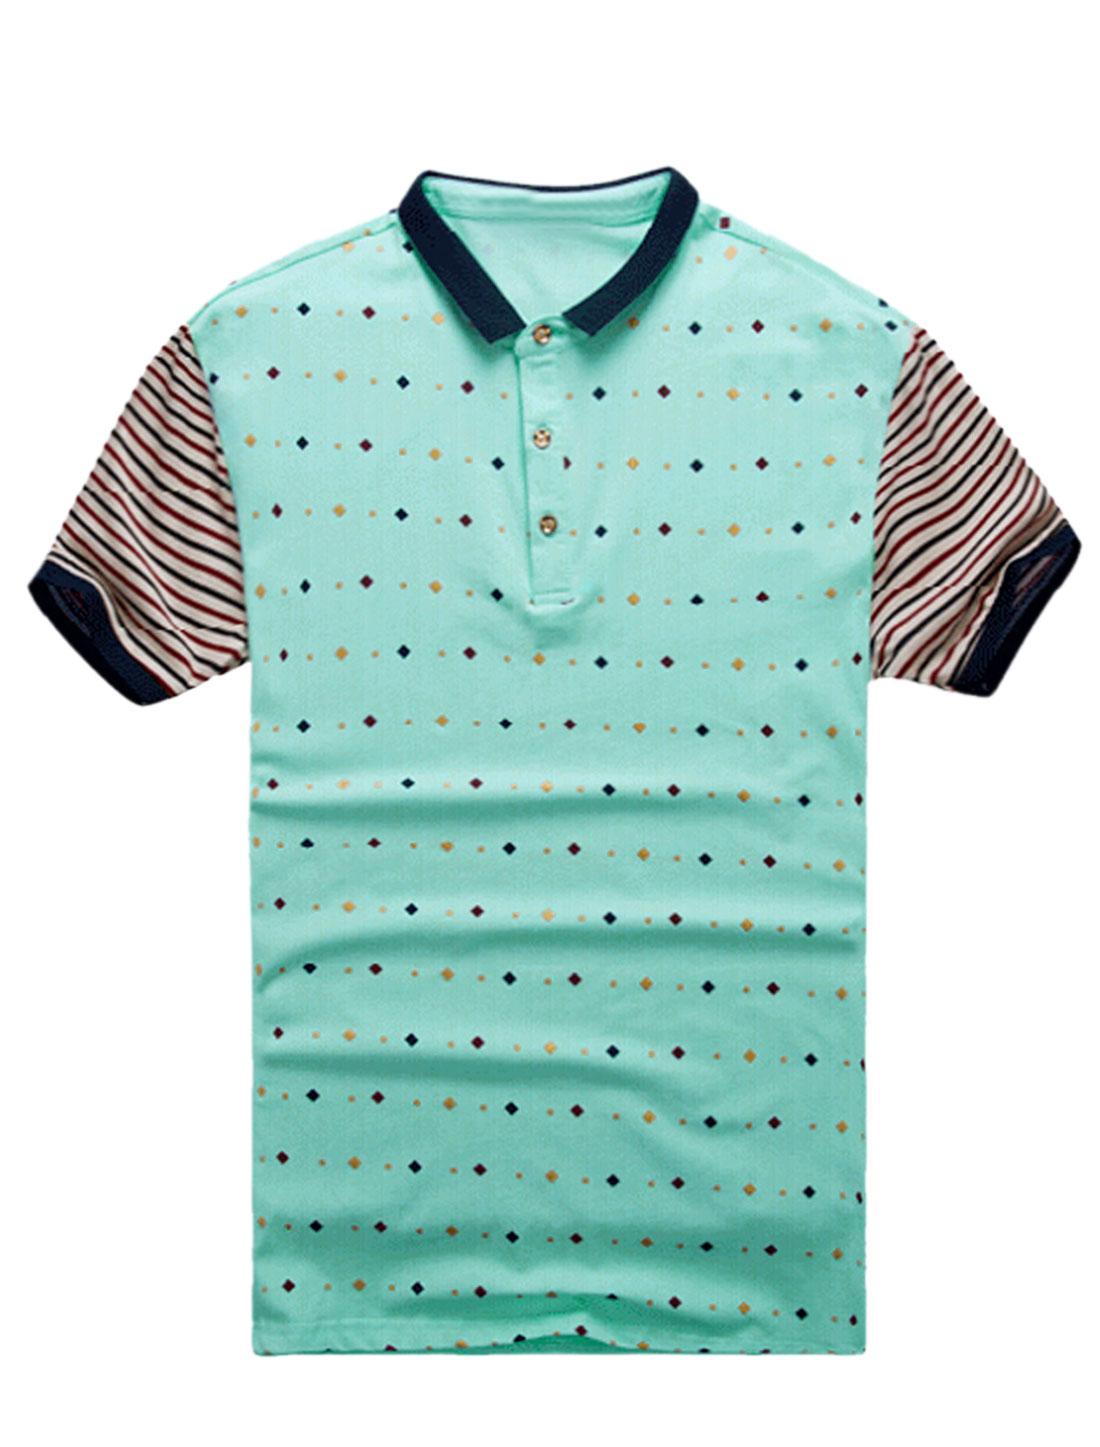 Men Stripes Geometric Prints Buttons Closed Upper T-shirt Aqua Beige M